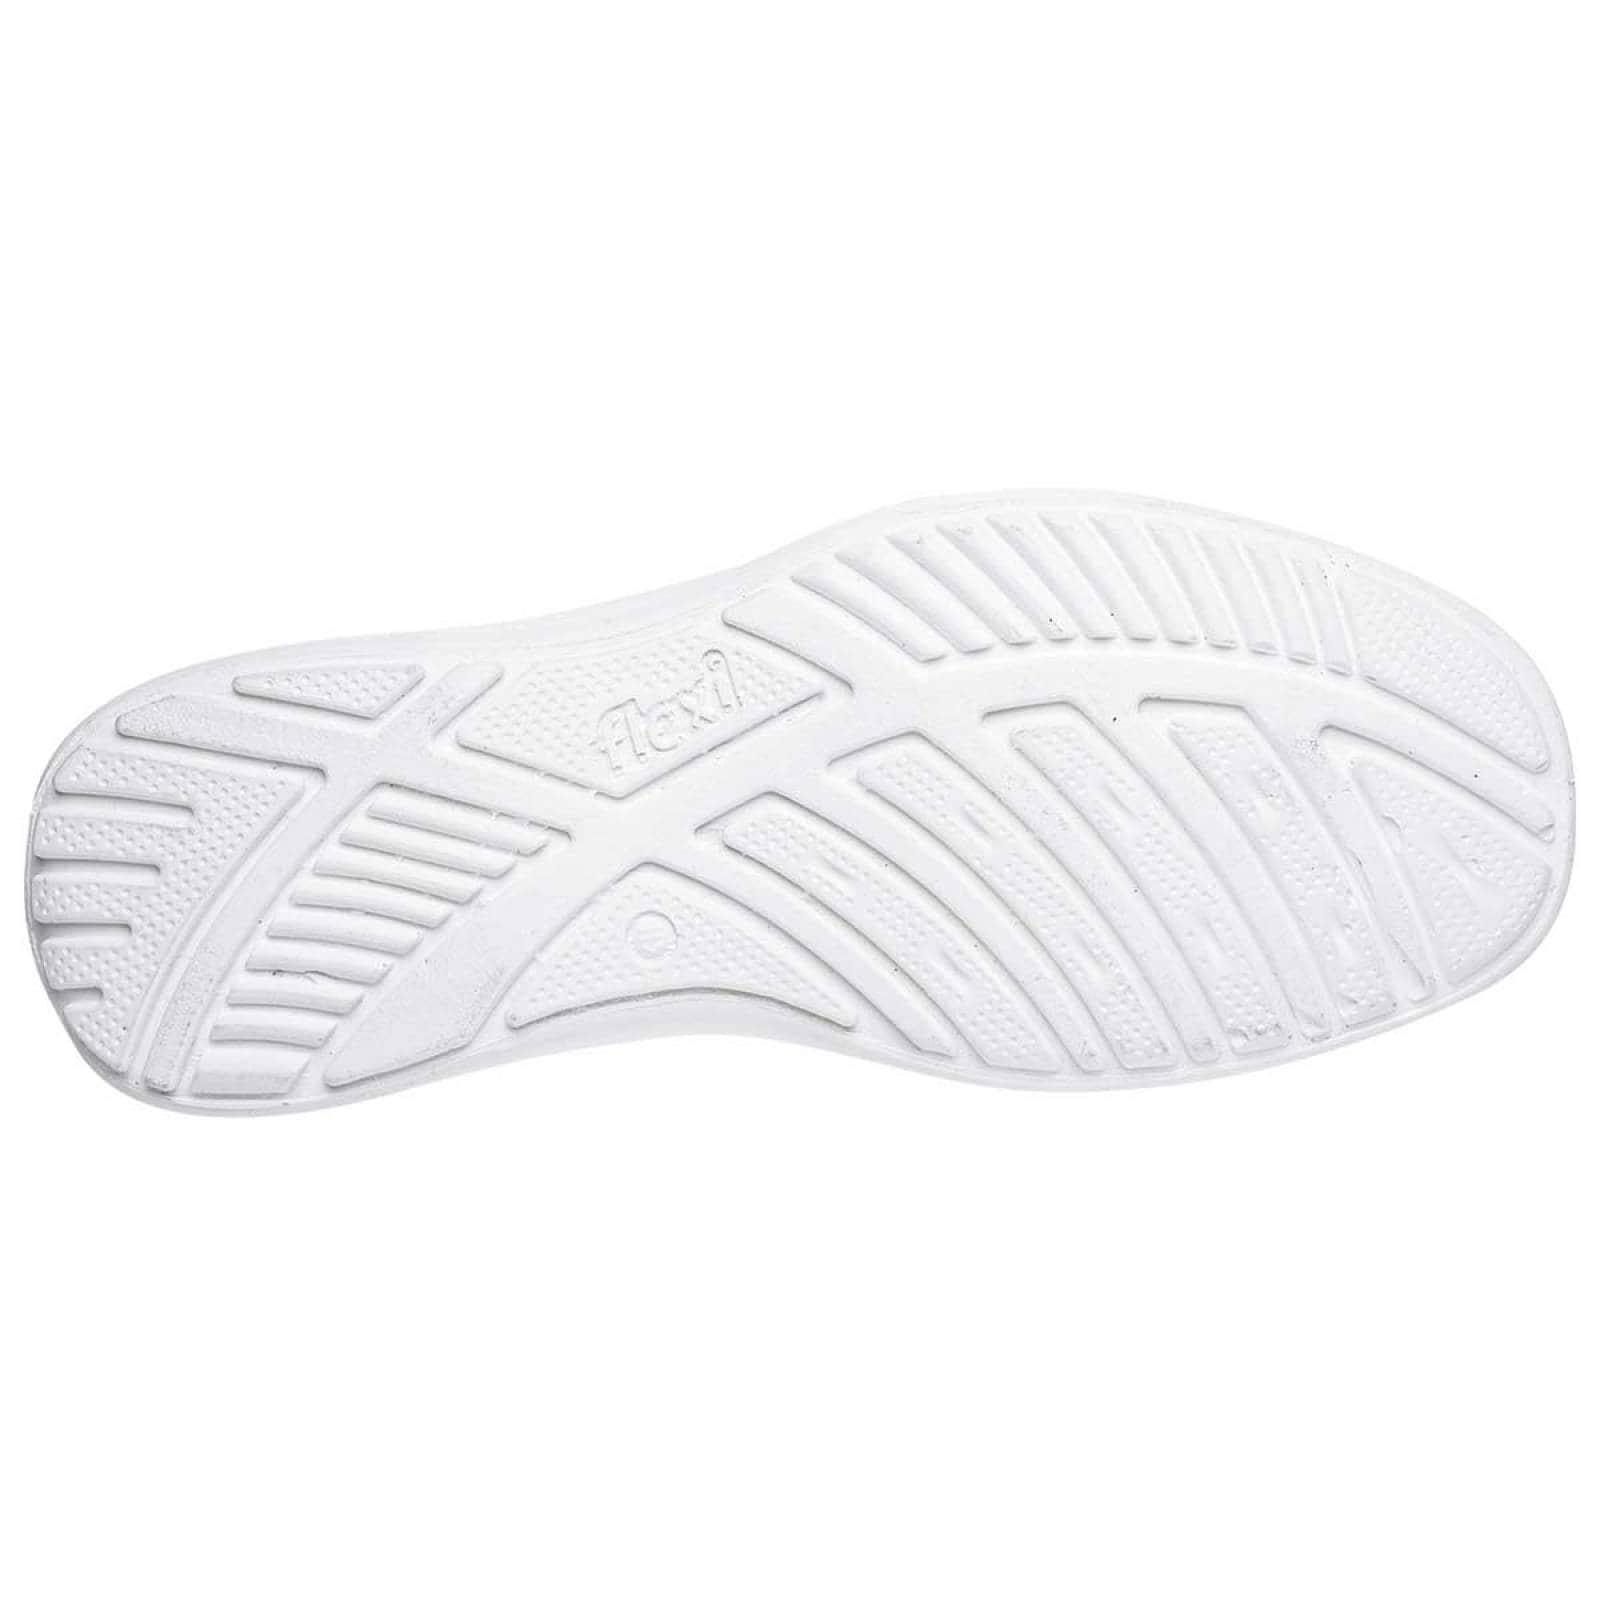 Flexi Zapato Hombre Blanco